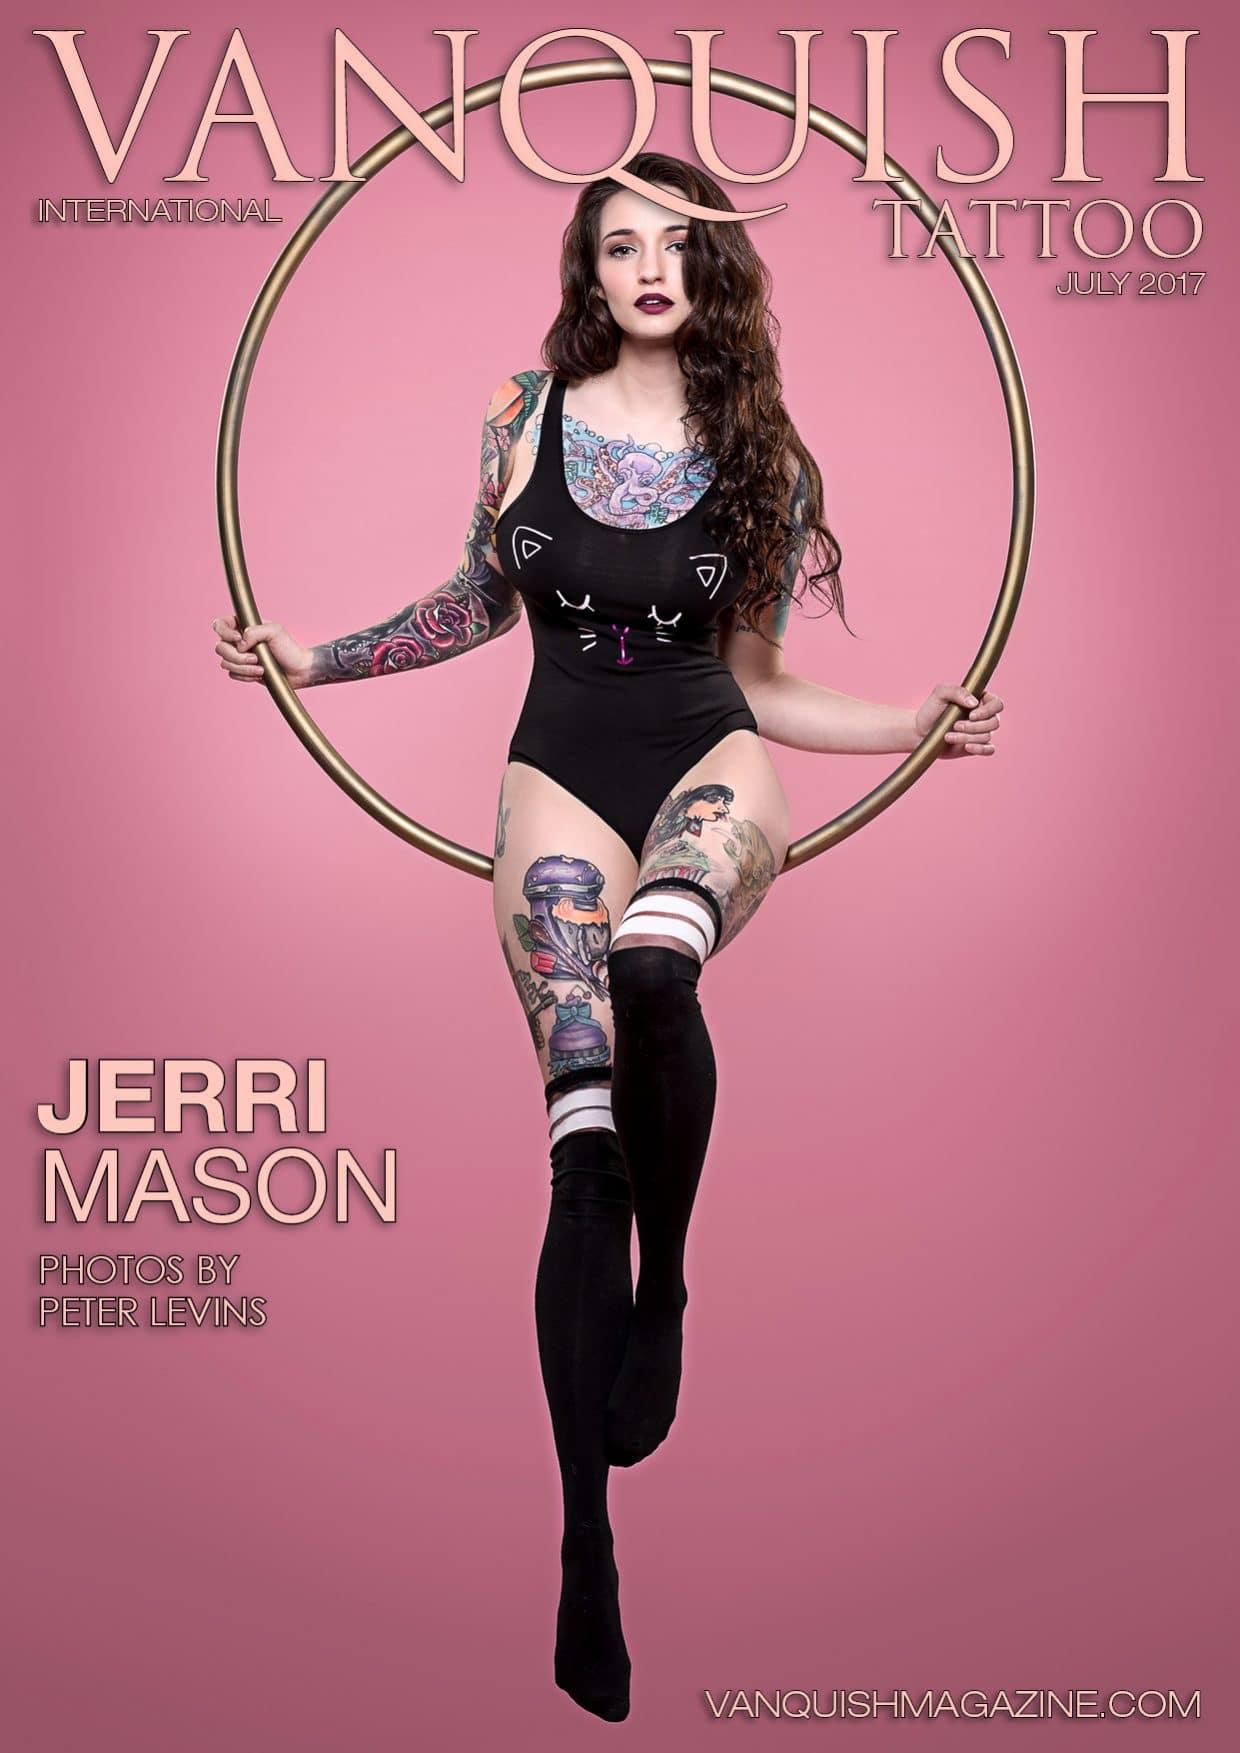 Vanquish Tattoo Magazine – July 2017 – Jerri Mason 1